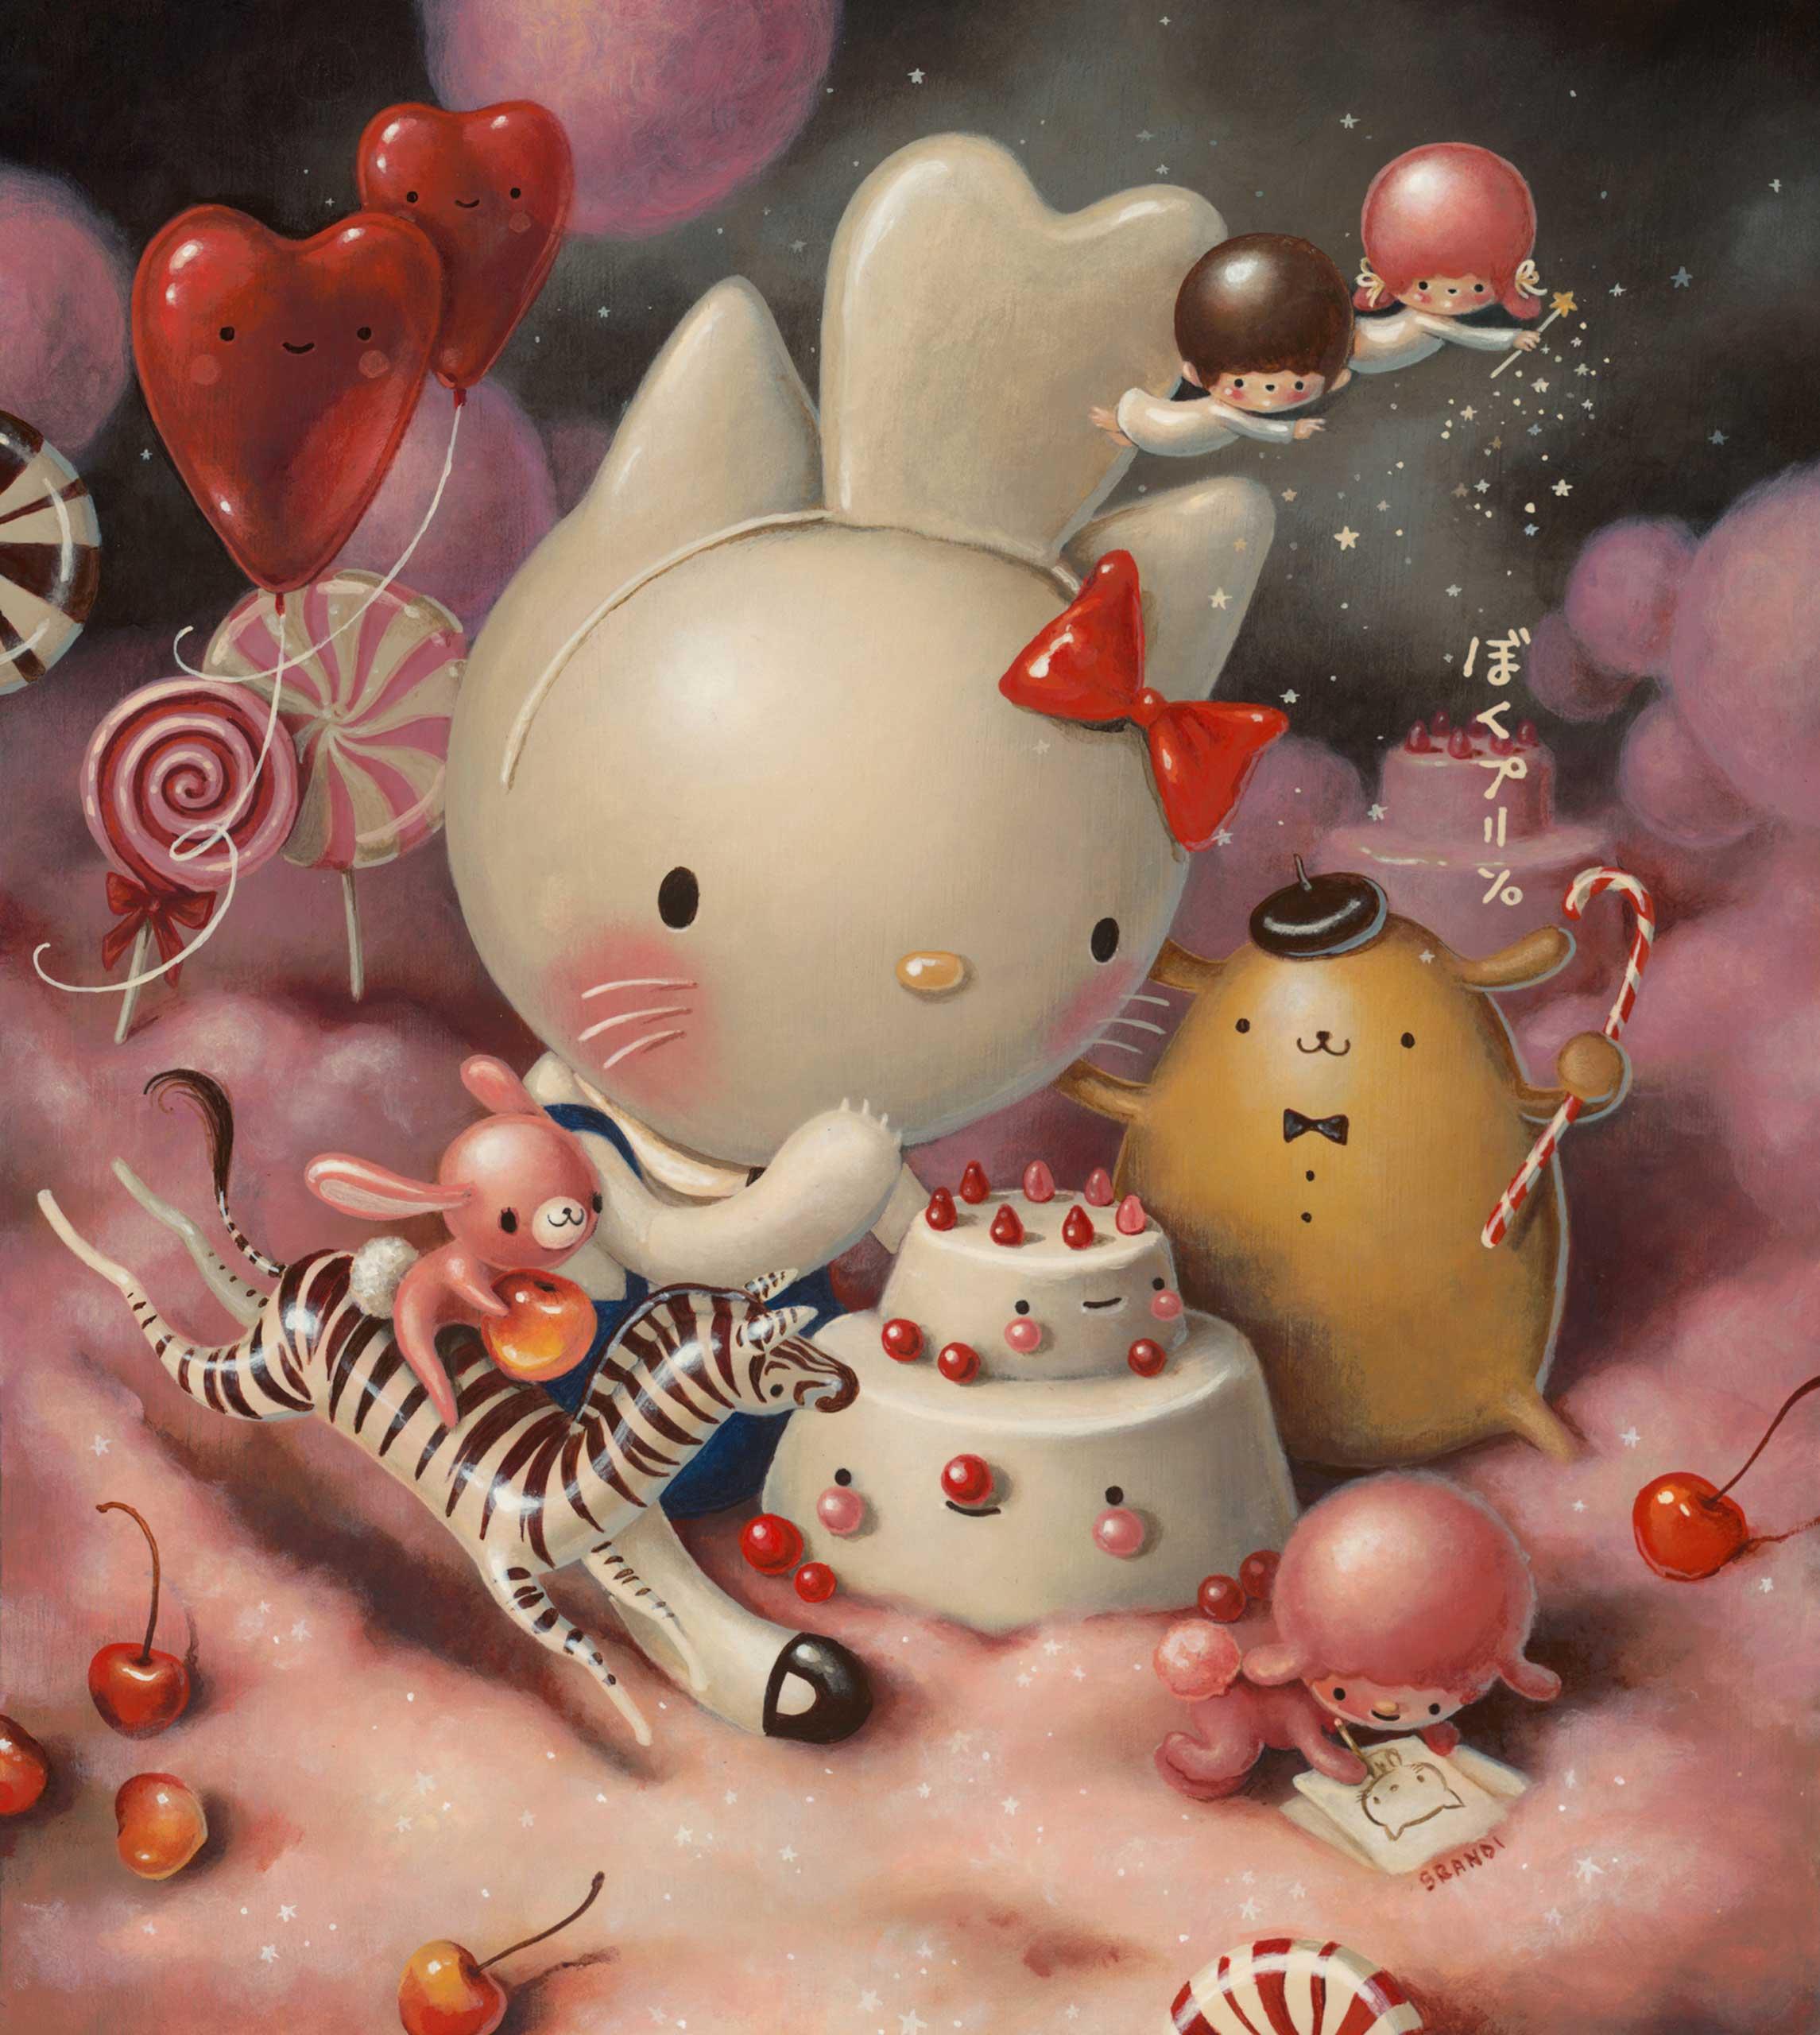 'Eat Cakes, You Kitty' by Brandi Milne